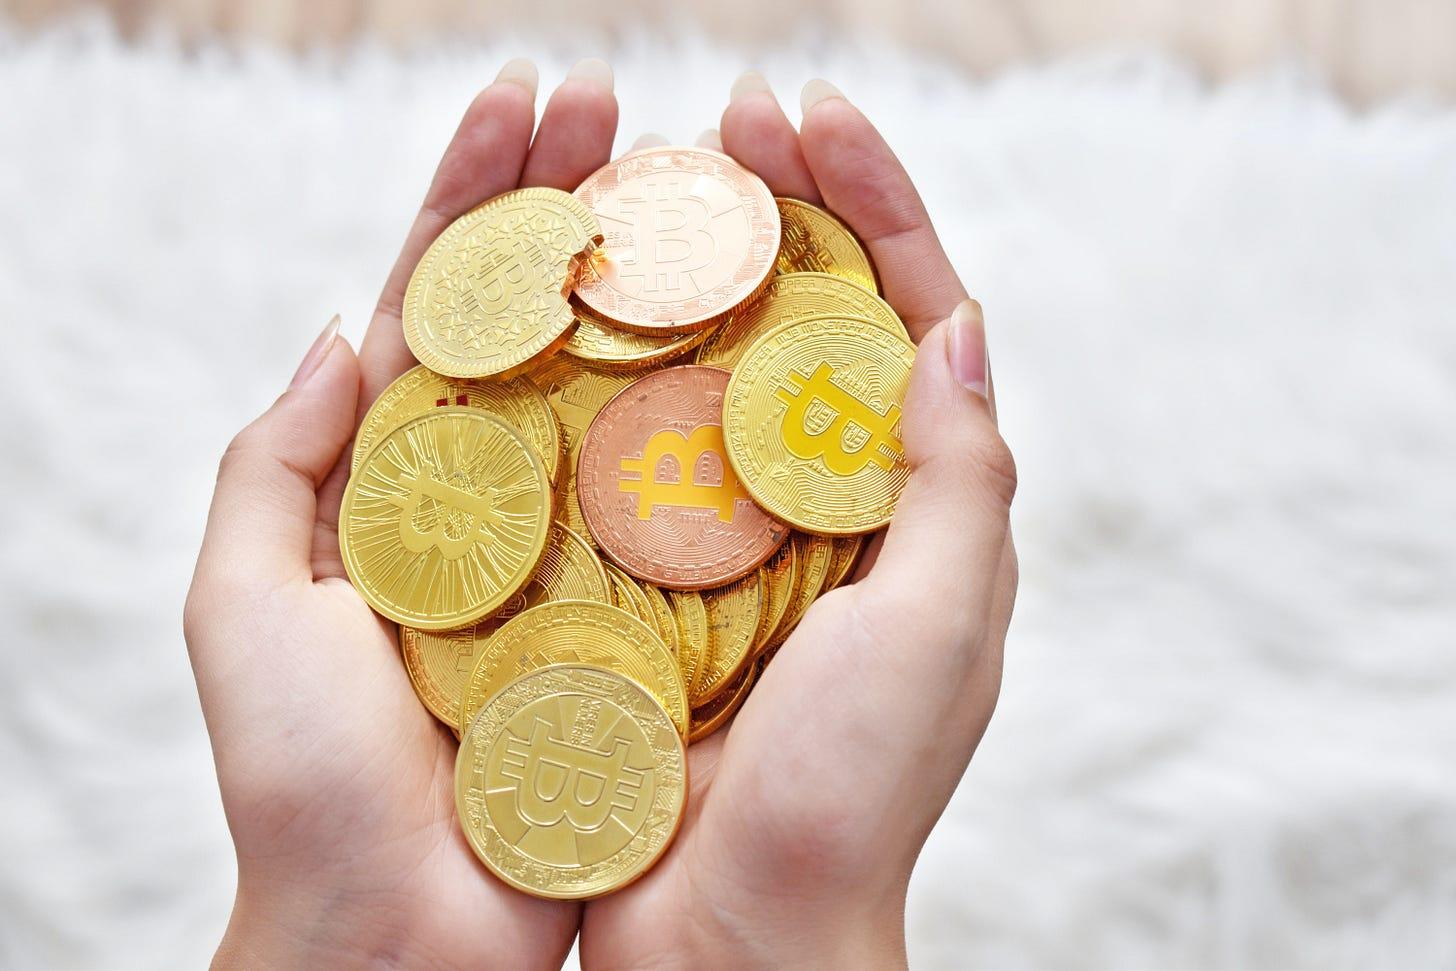 Novelty Bitcoin tokens held in a hand. Via Unsplash